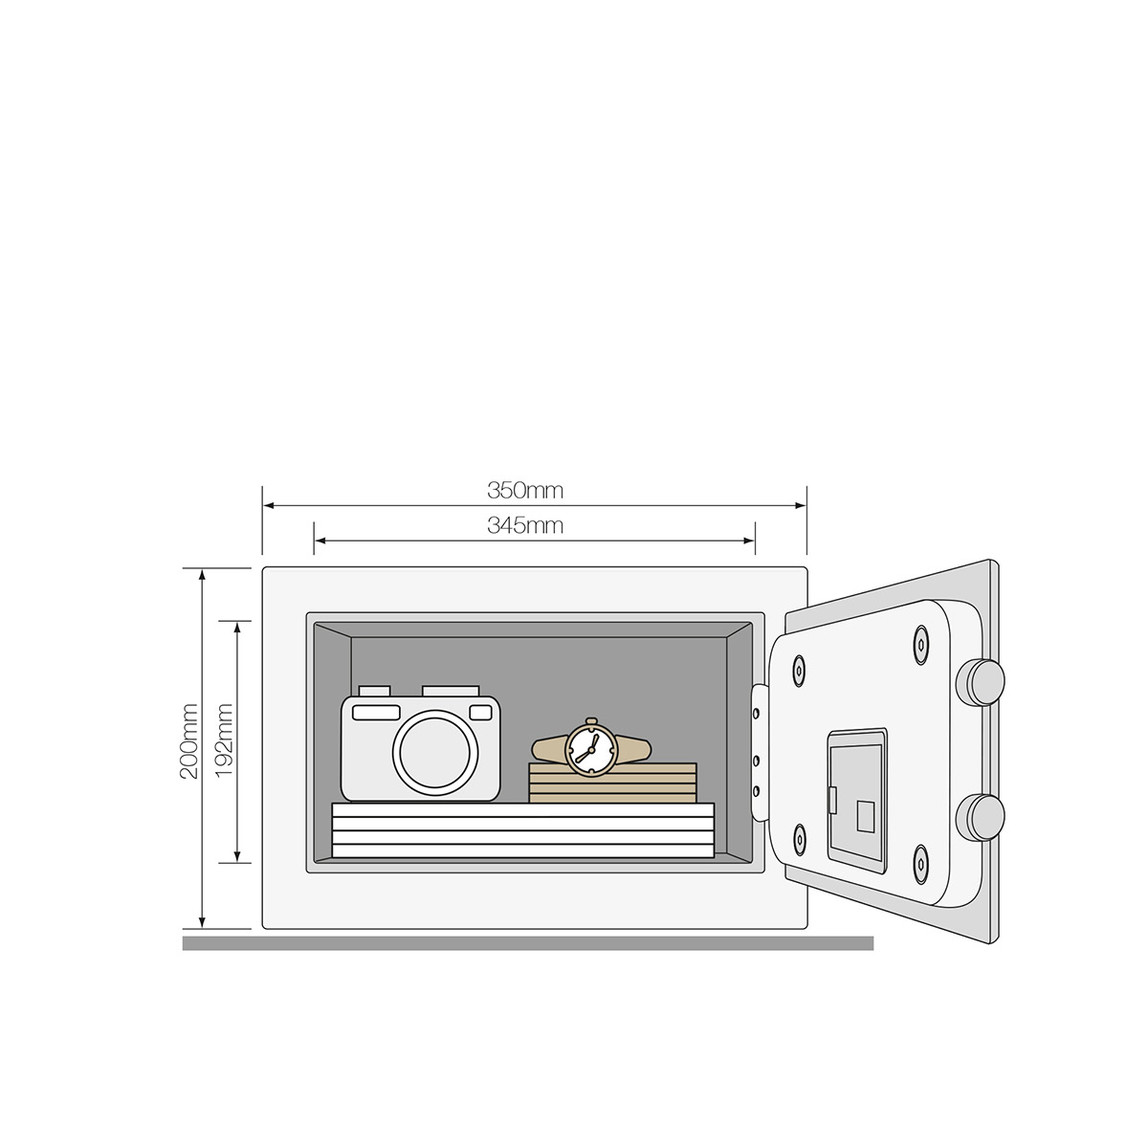 Yale Yüksek Güvenlikli Parmak İzli Motorlu Kasa - Compact Tipi